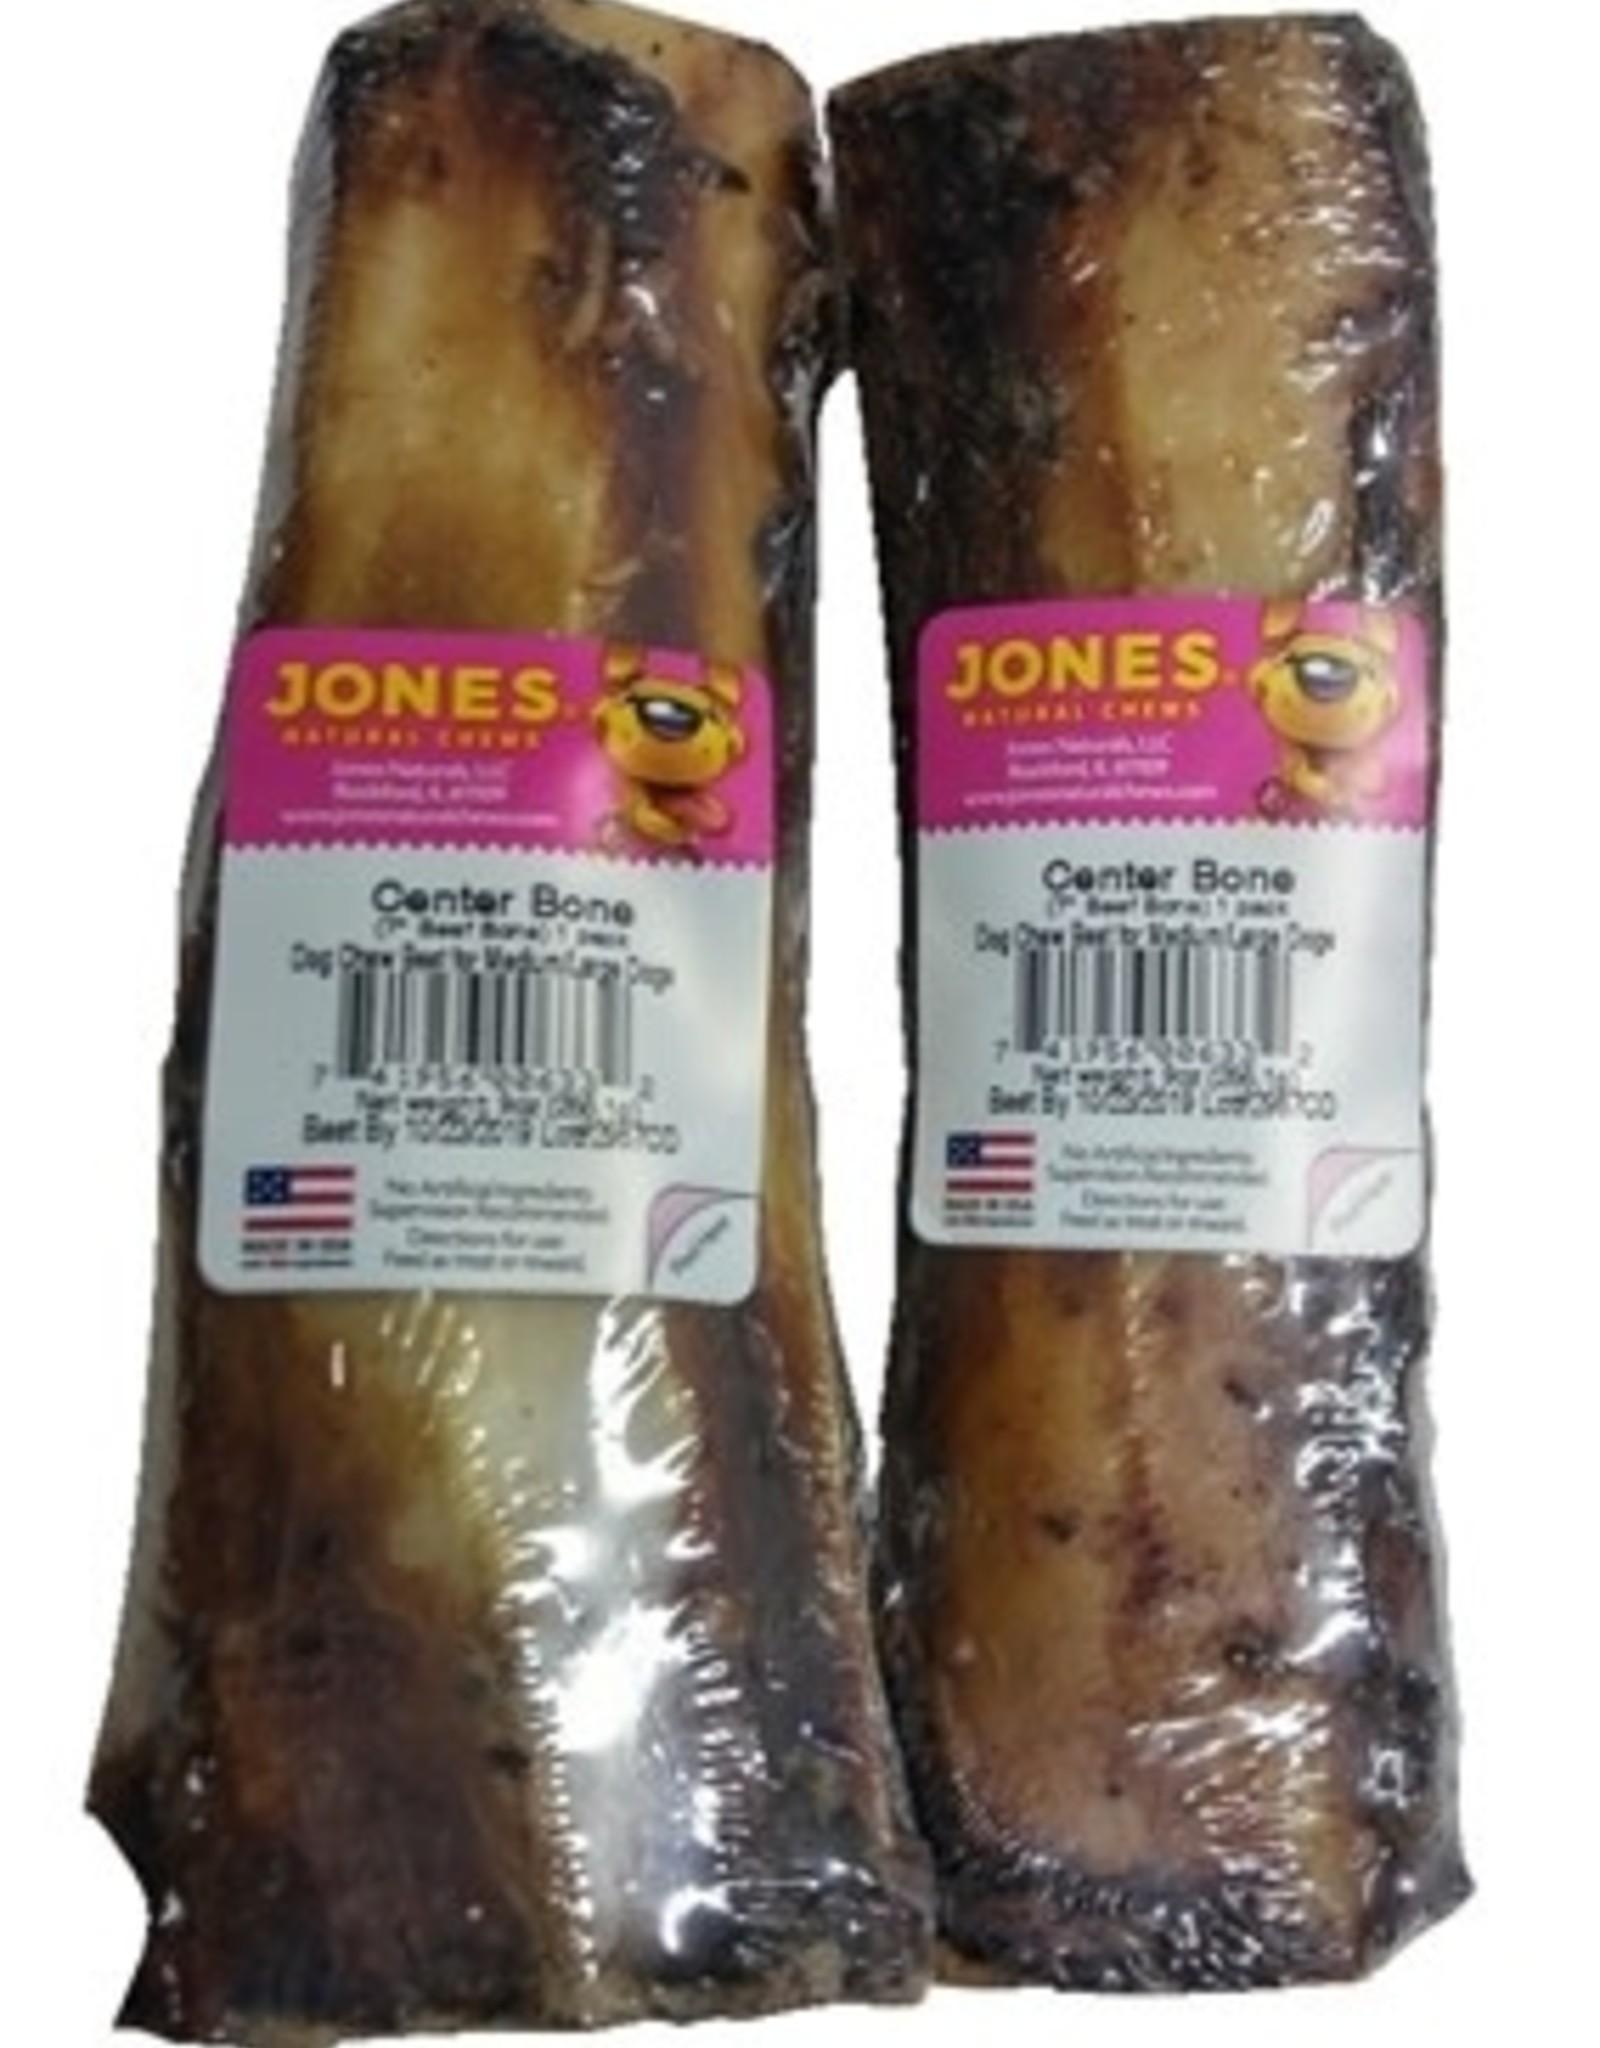 Jones K9 Center Bone